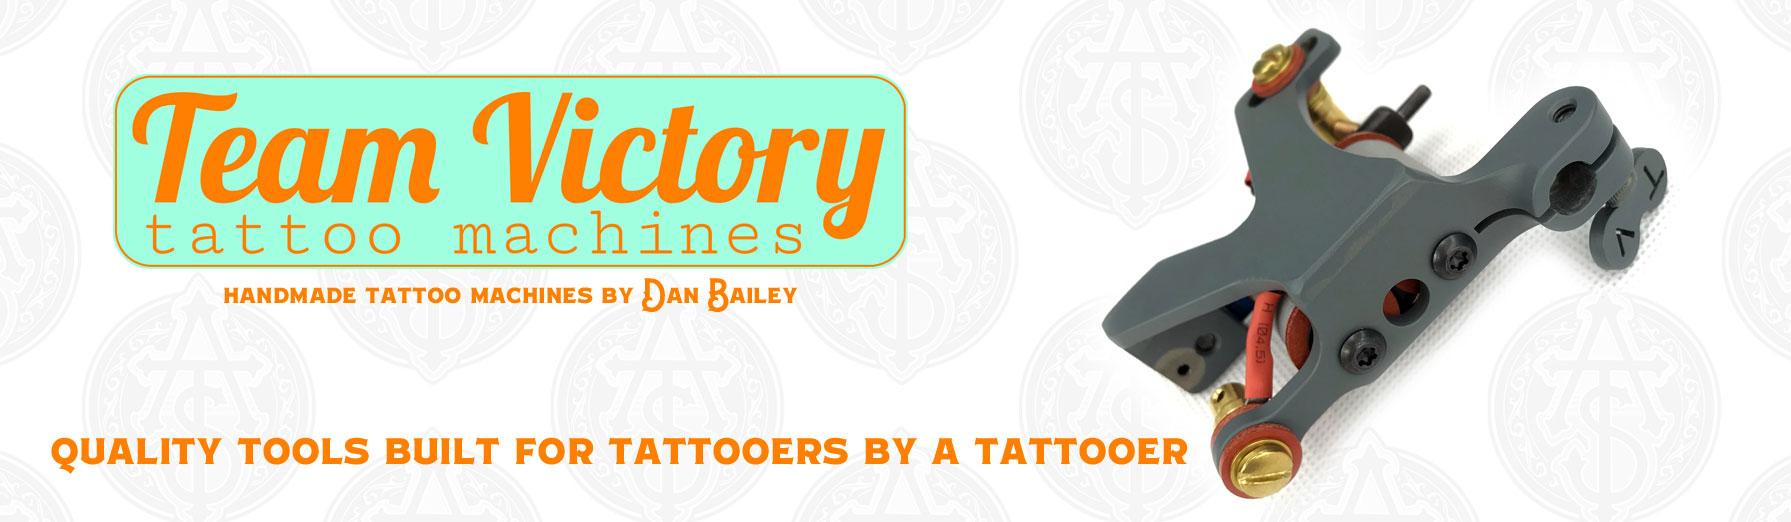 Team Victory Tattoo Machines - Alliance Tattoo Supply